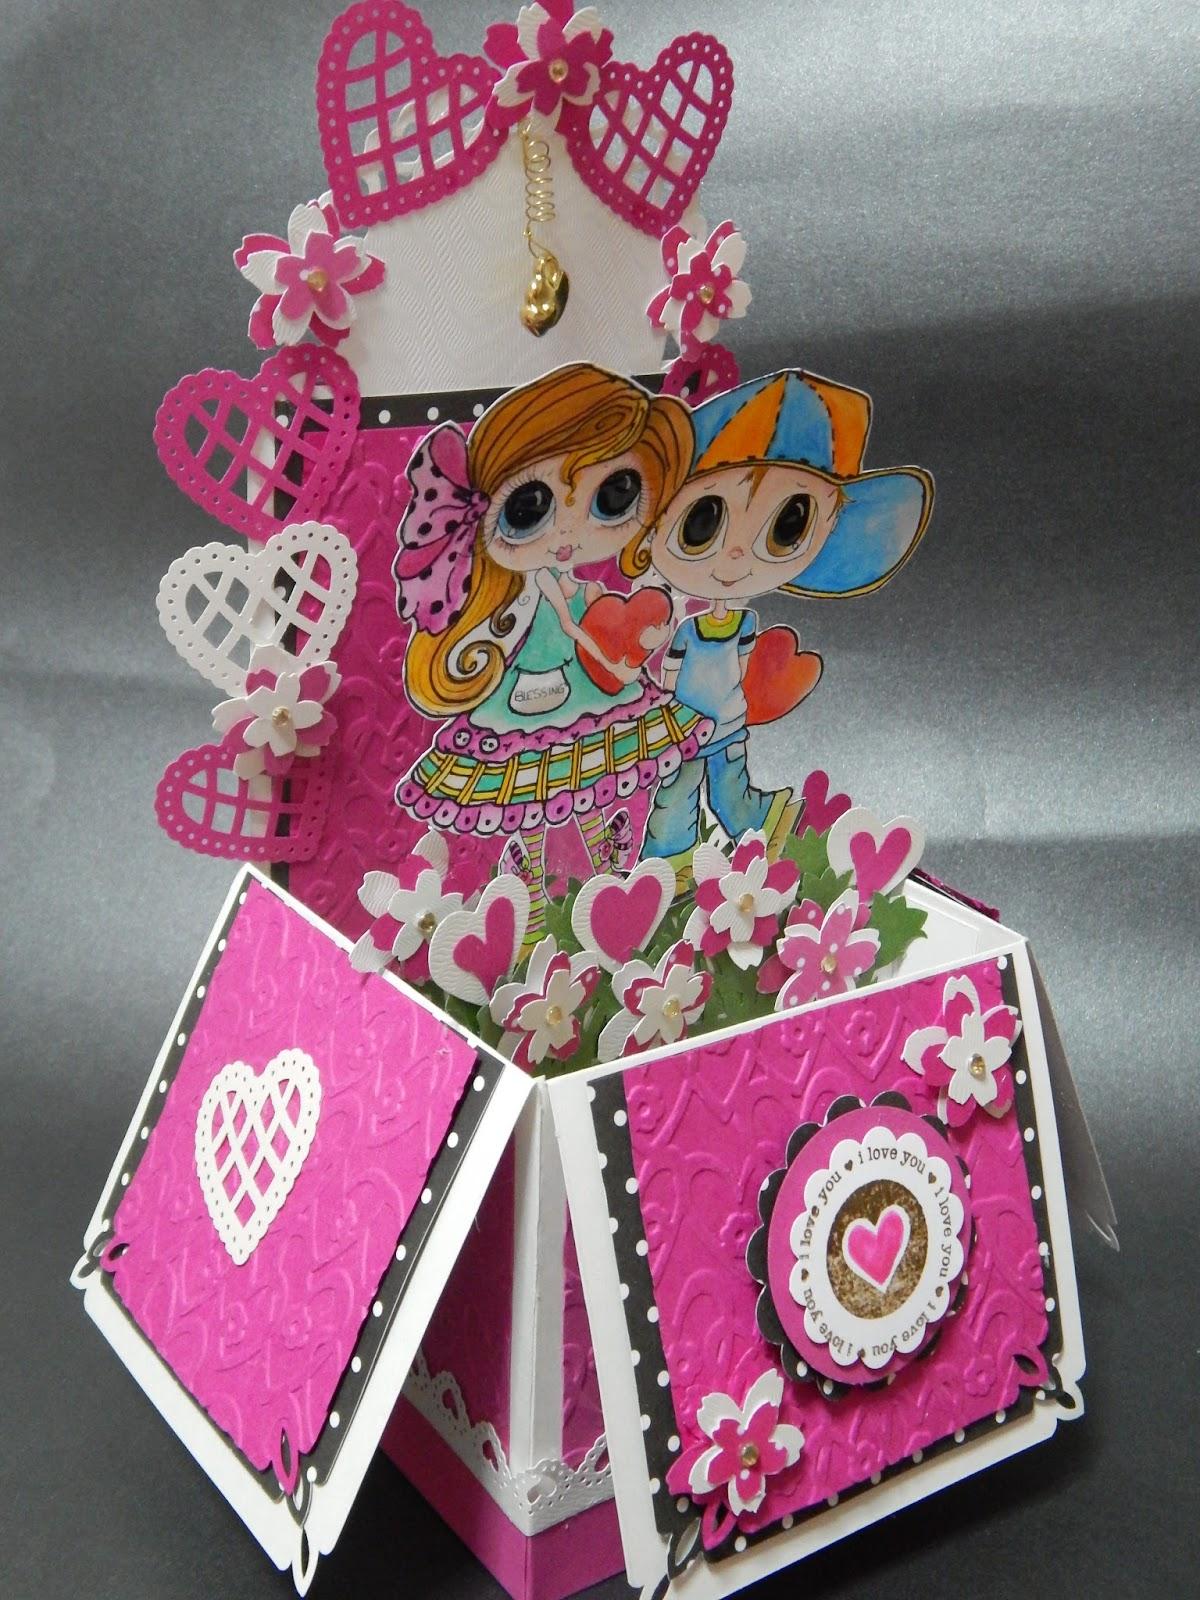 Arte con papel madera e hilos caja sorpresa san valentin - Sorpresas para enamorados ...